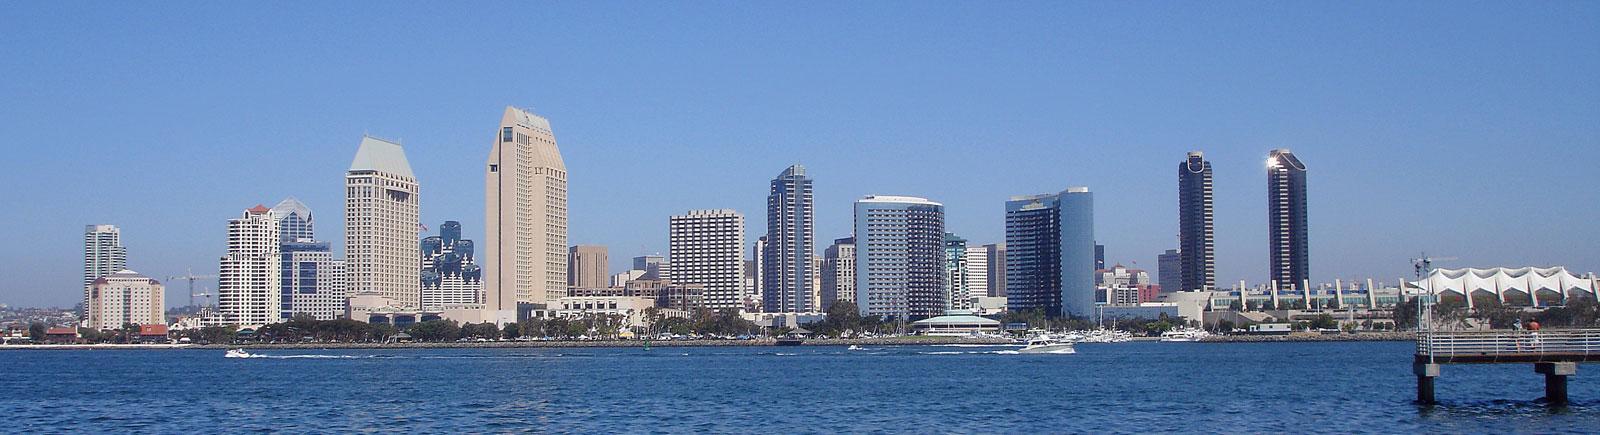 San Diego Convention Center, California